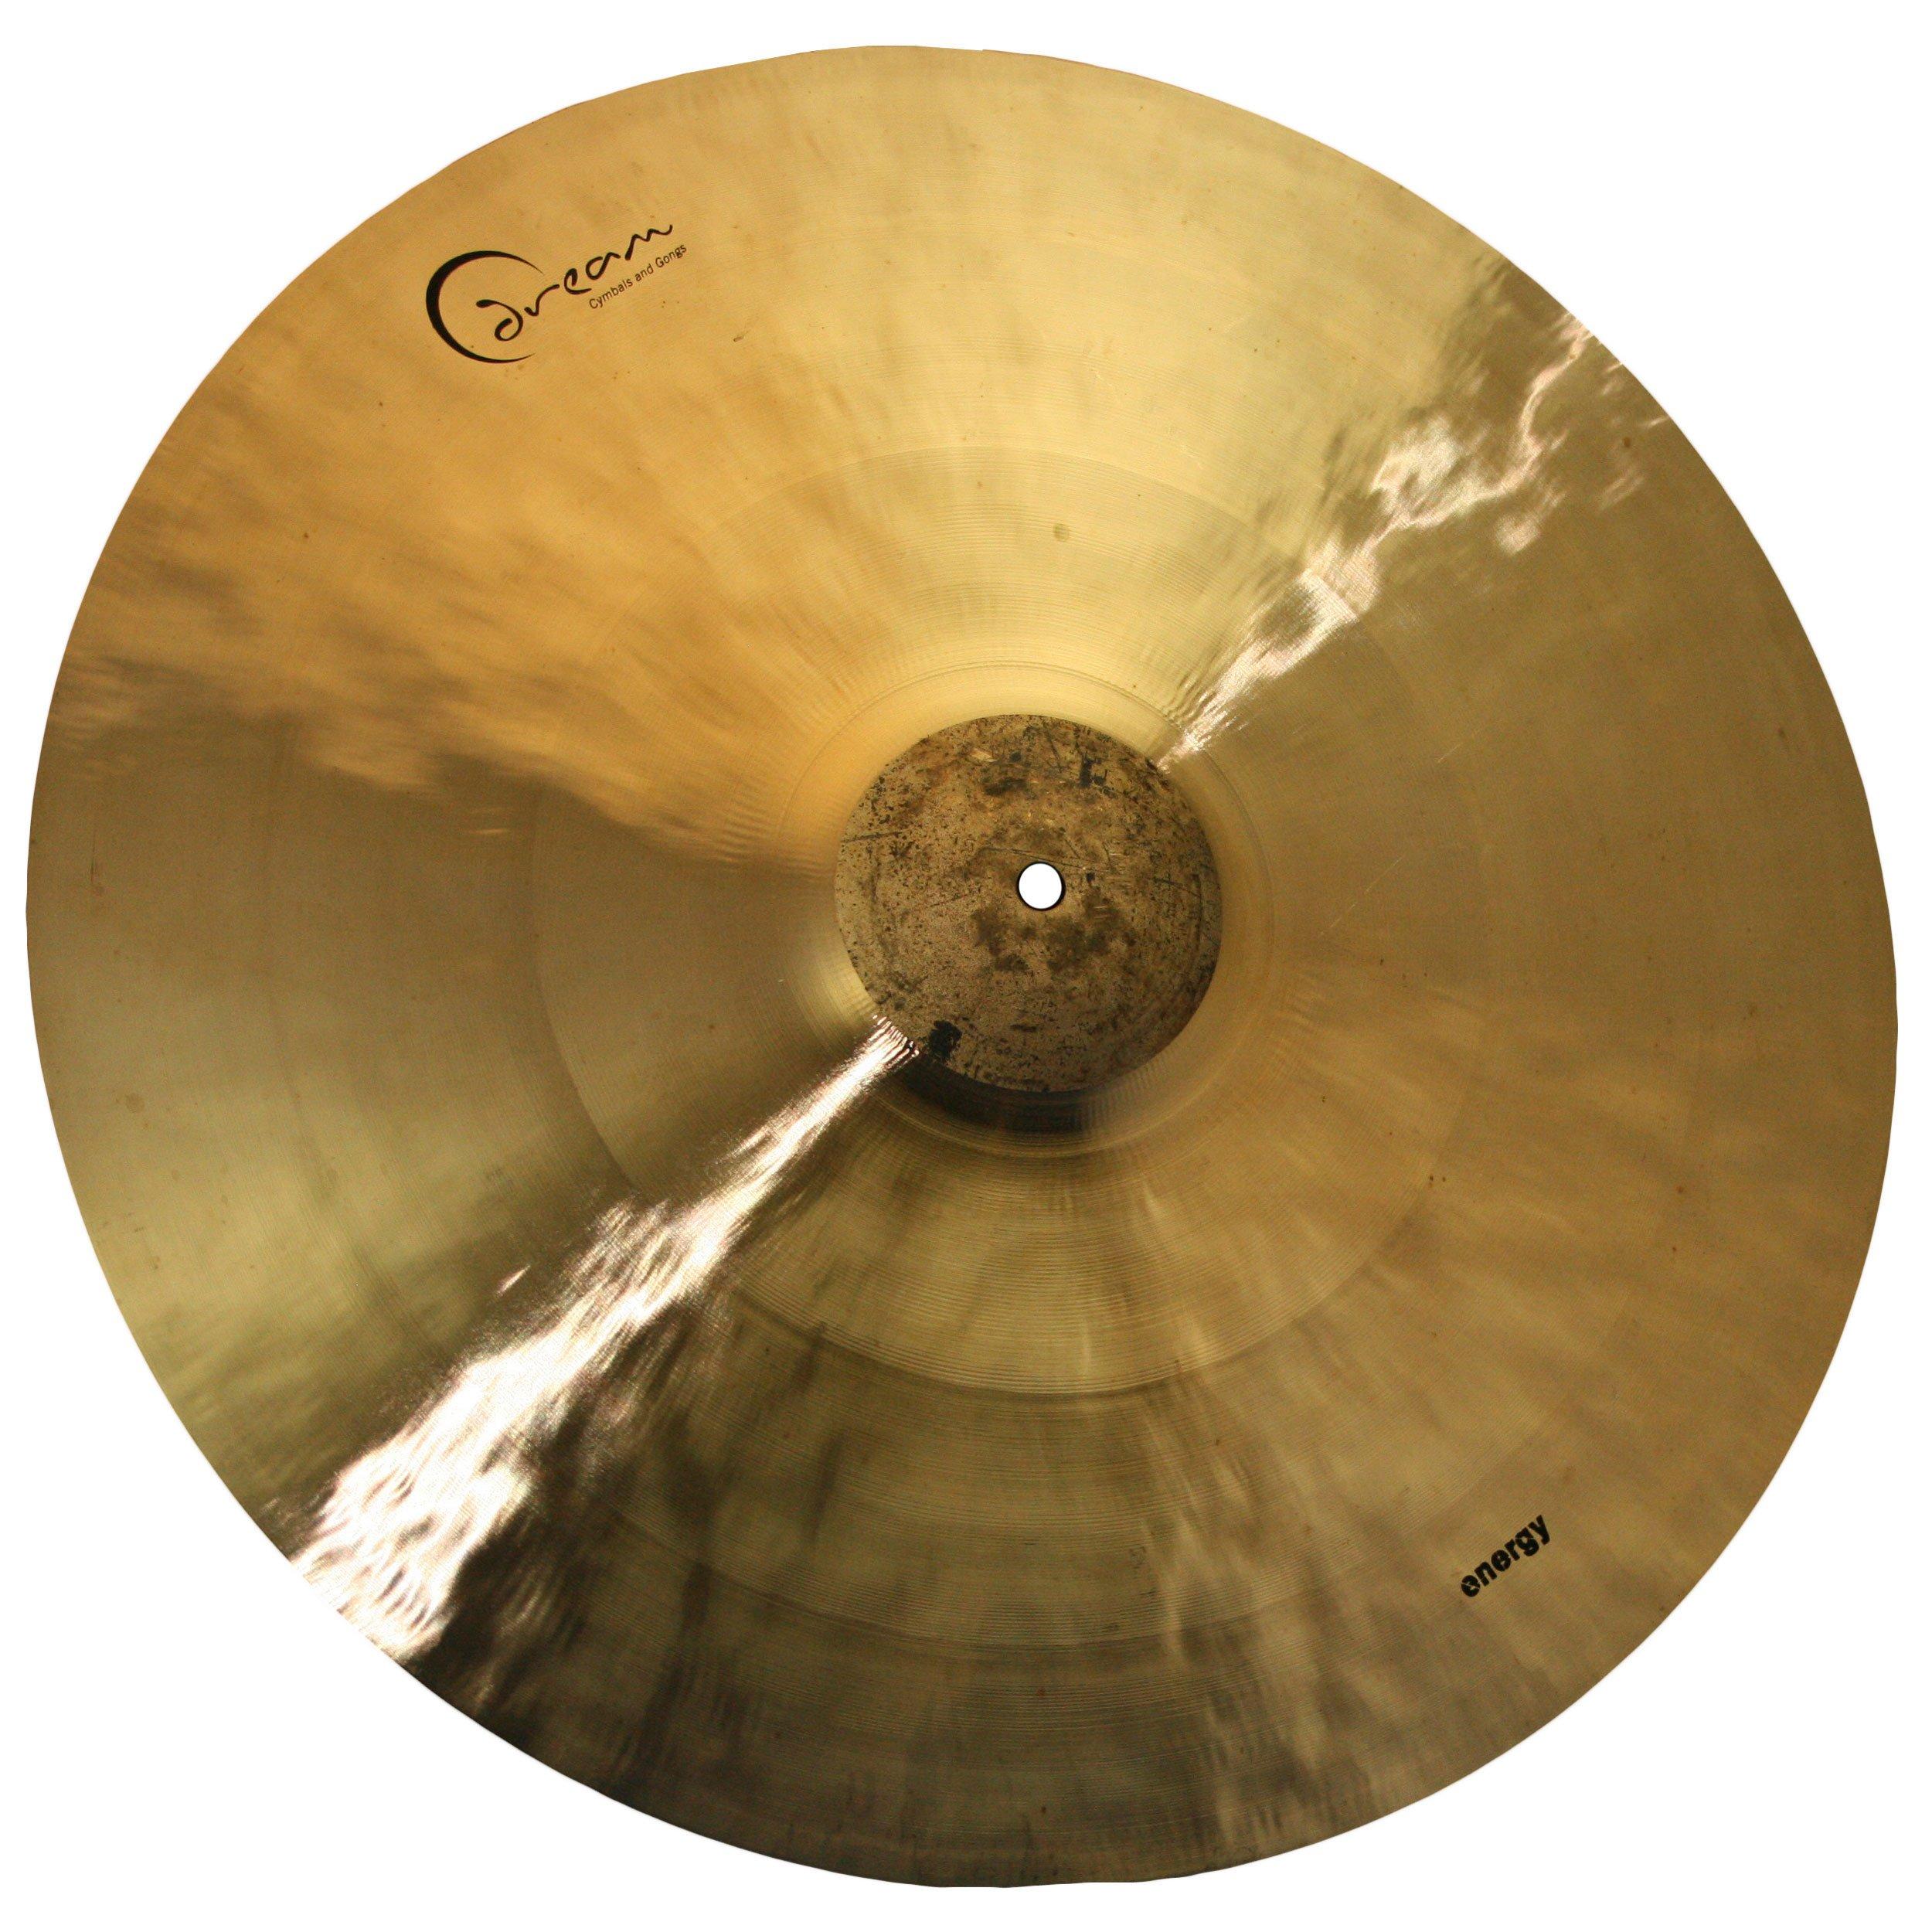 Dream Cymbals ERI22 Energy Series Ride 22'' Cymbal